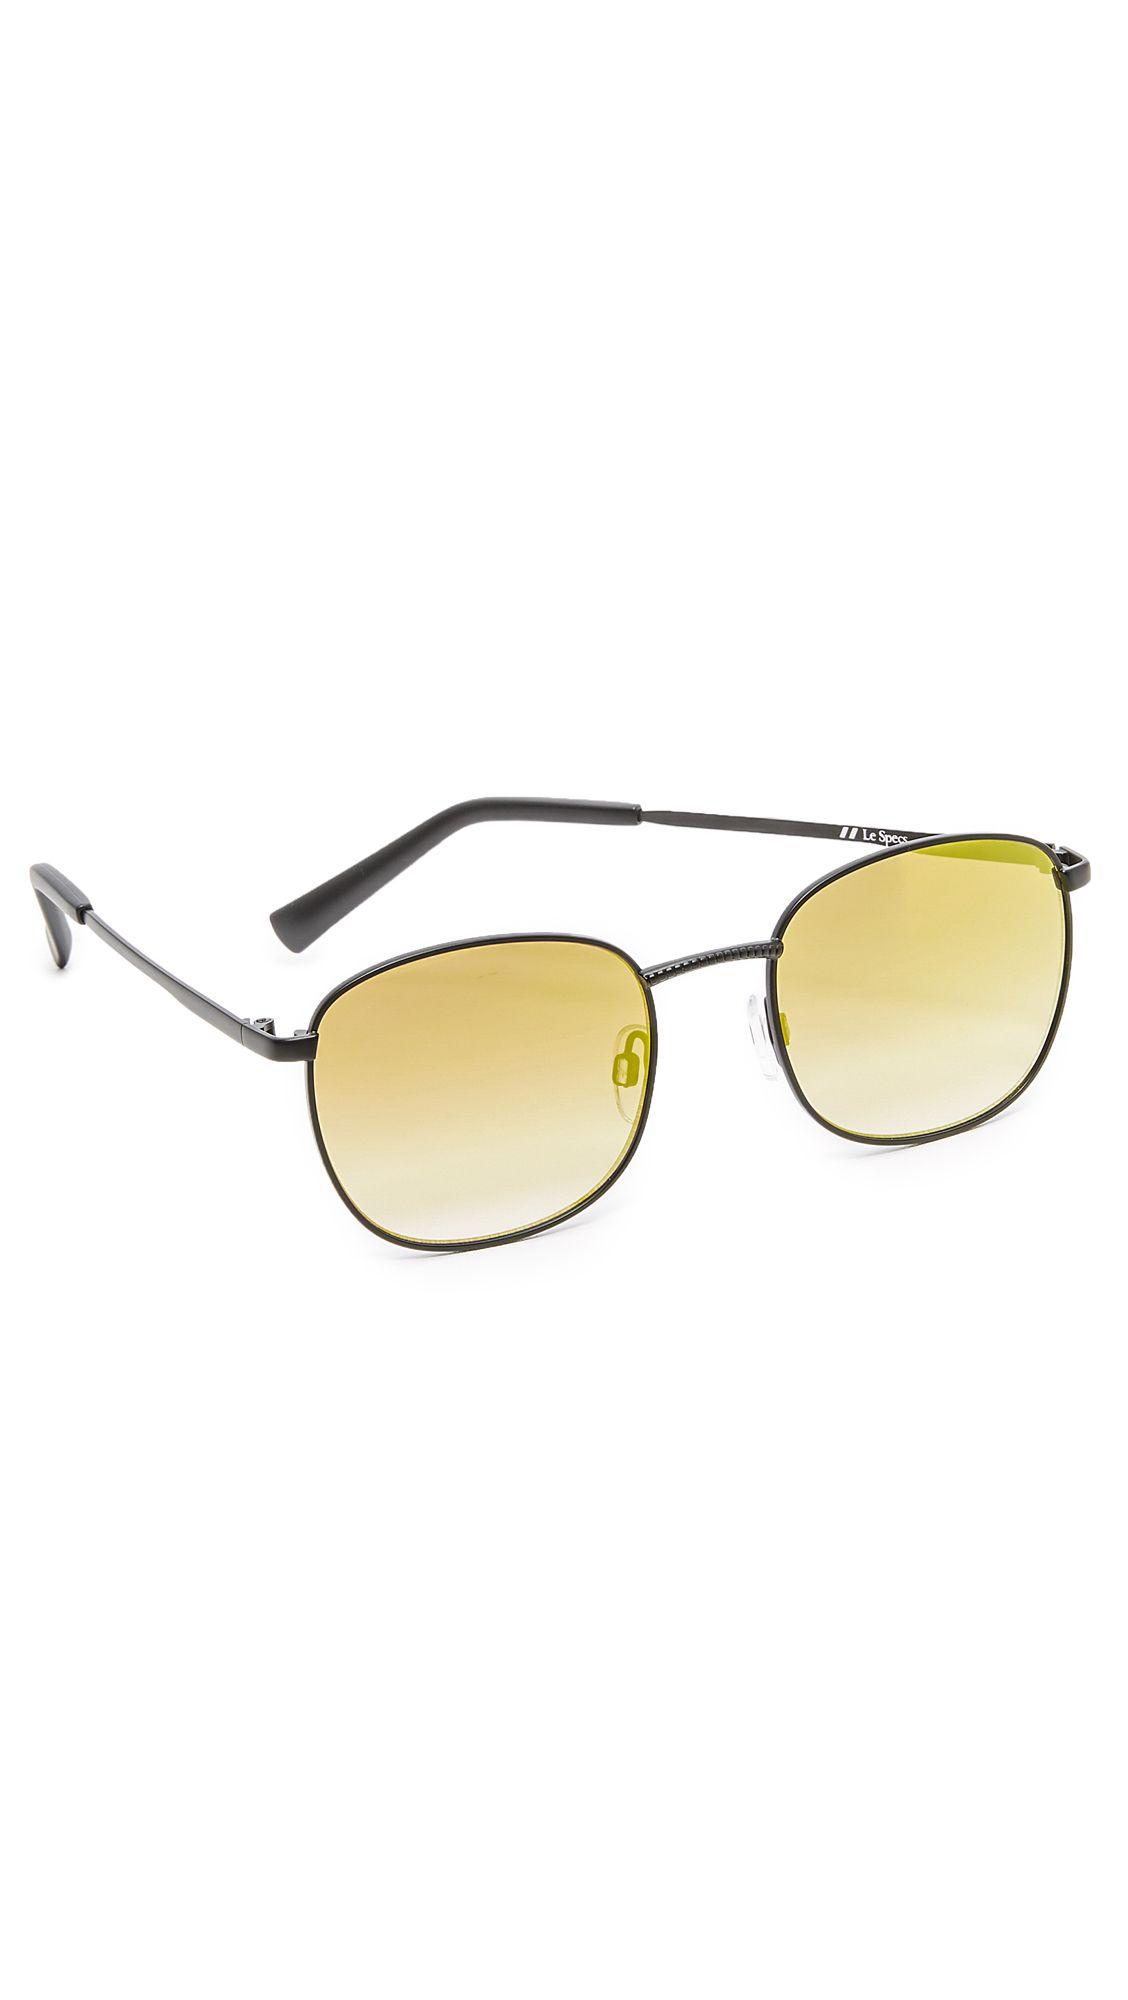 5b025074593 LE SPECS Neptune Sunglasses.  lespecs  sunglasses